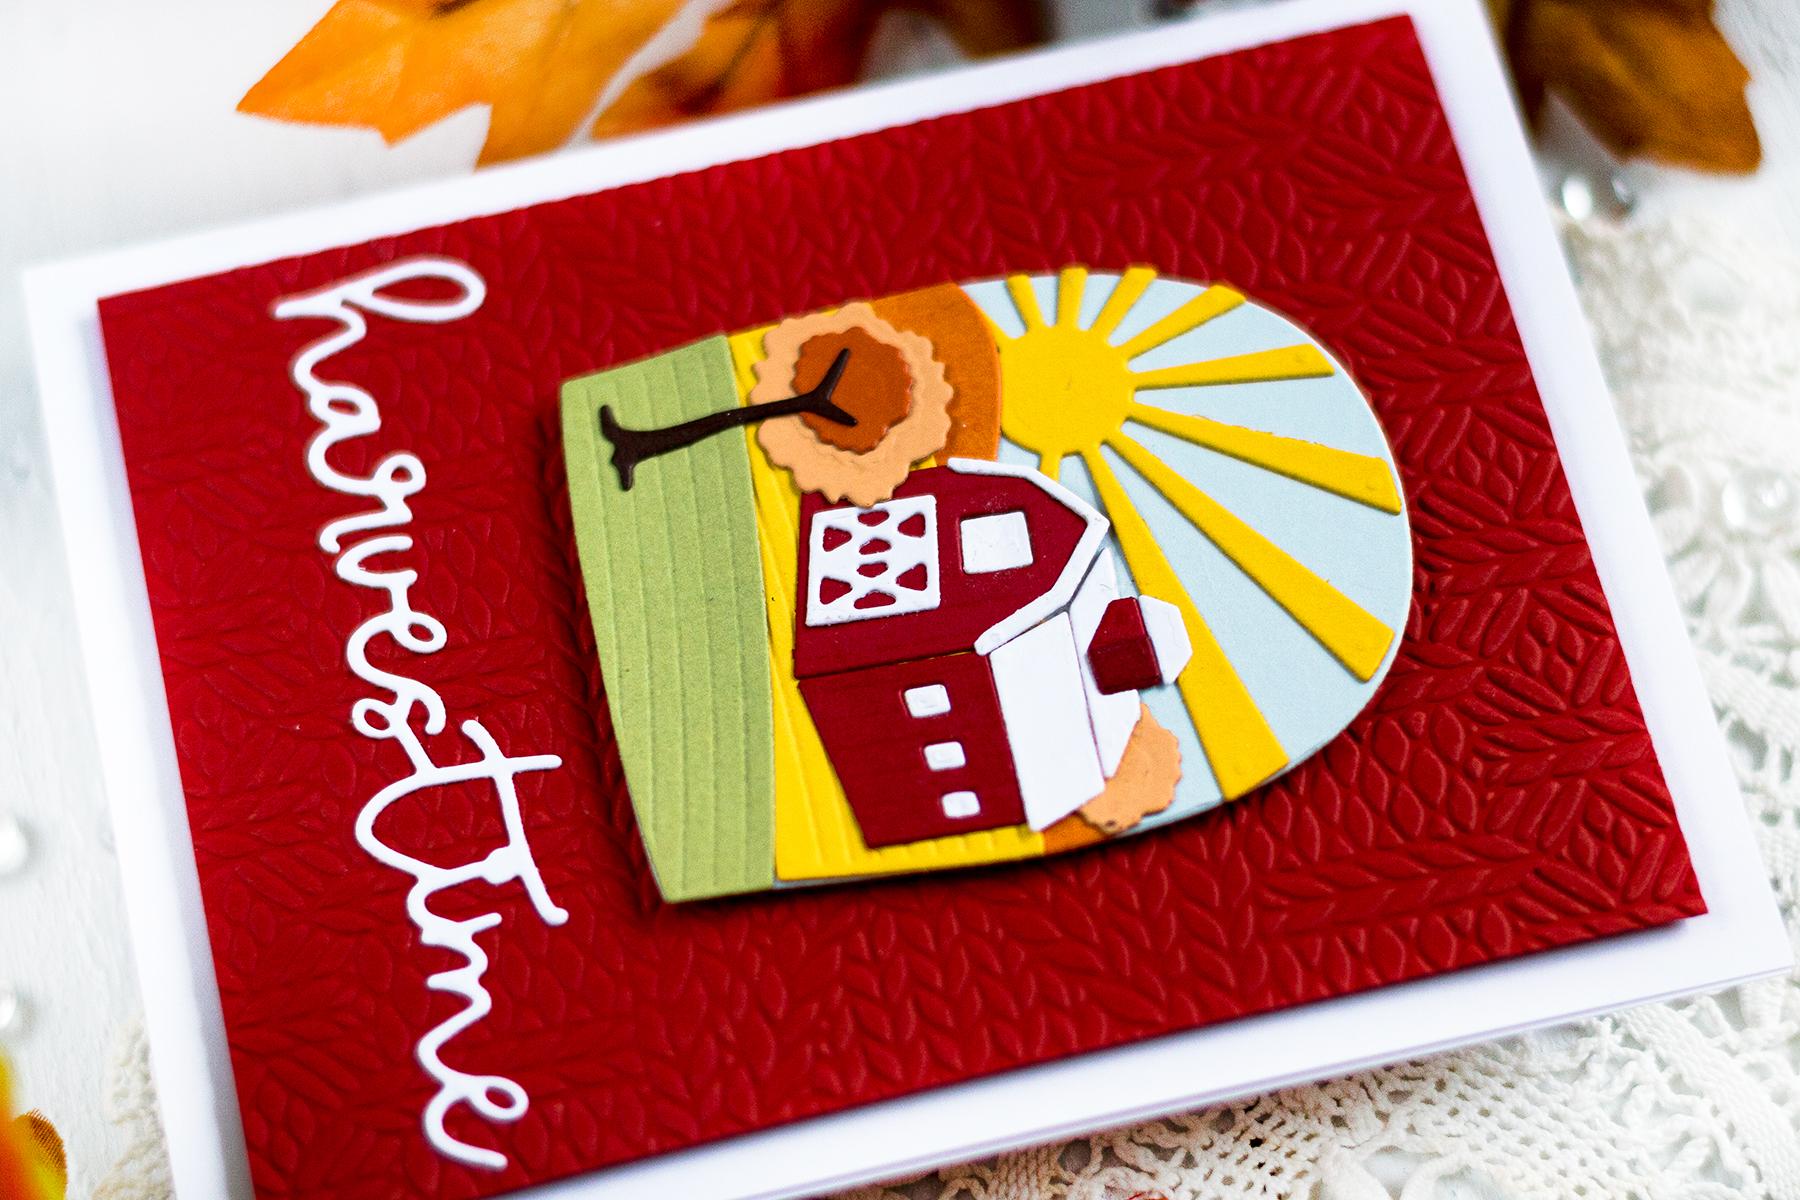 Harvest Scene Die Cut Card. Card by Svitlana Shayevich